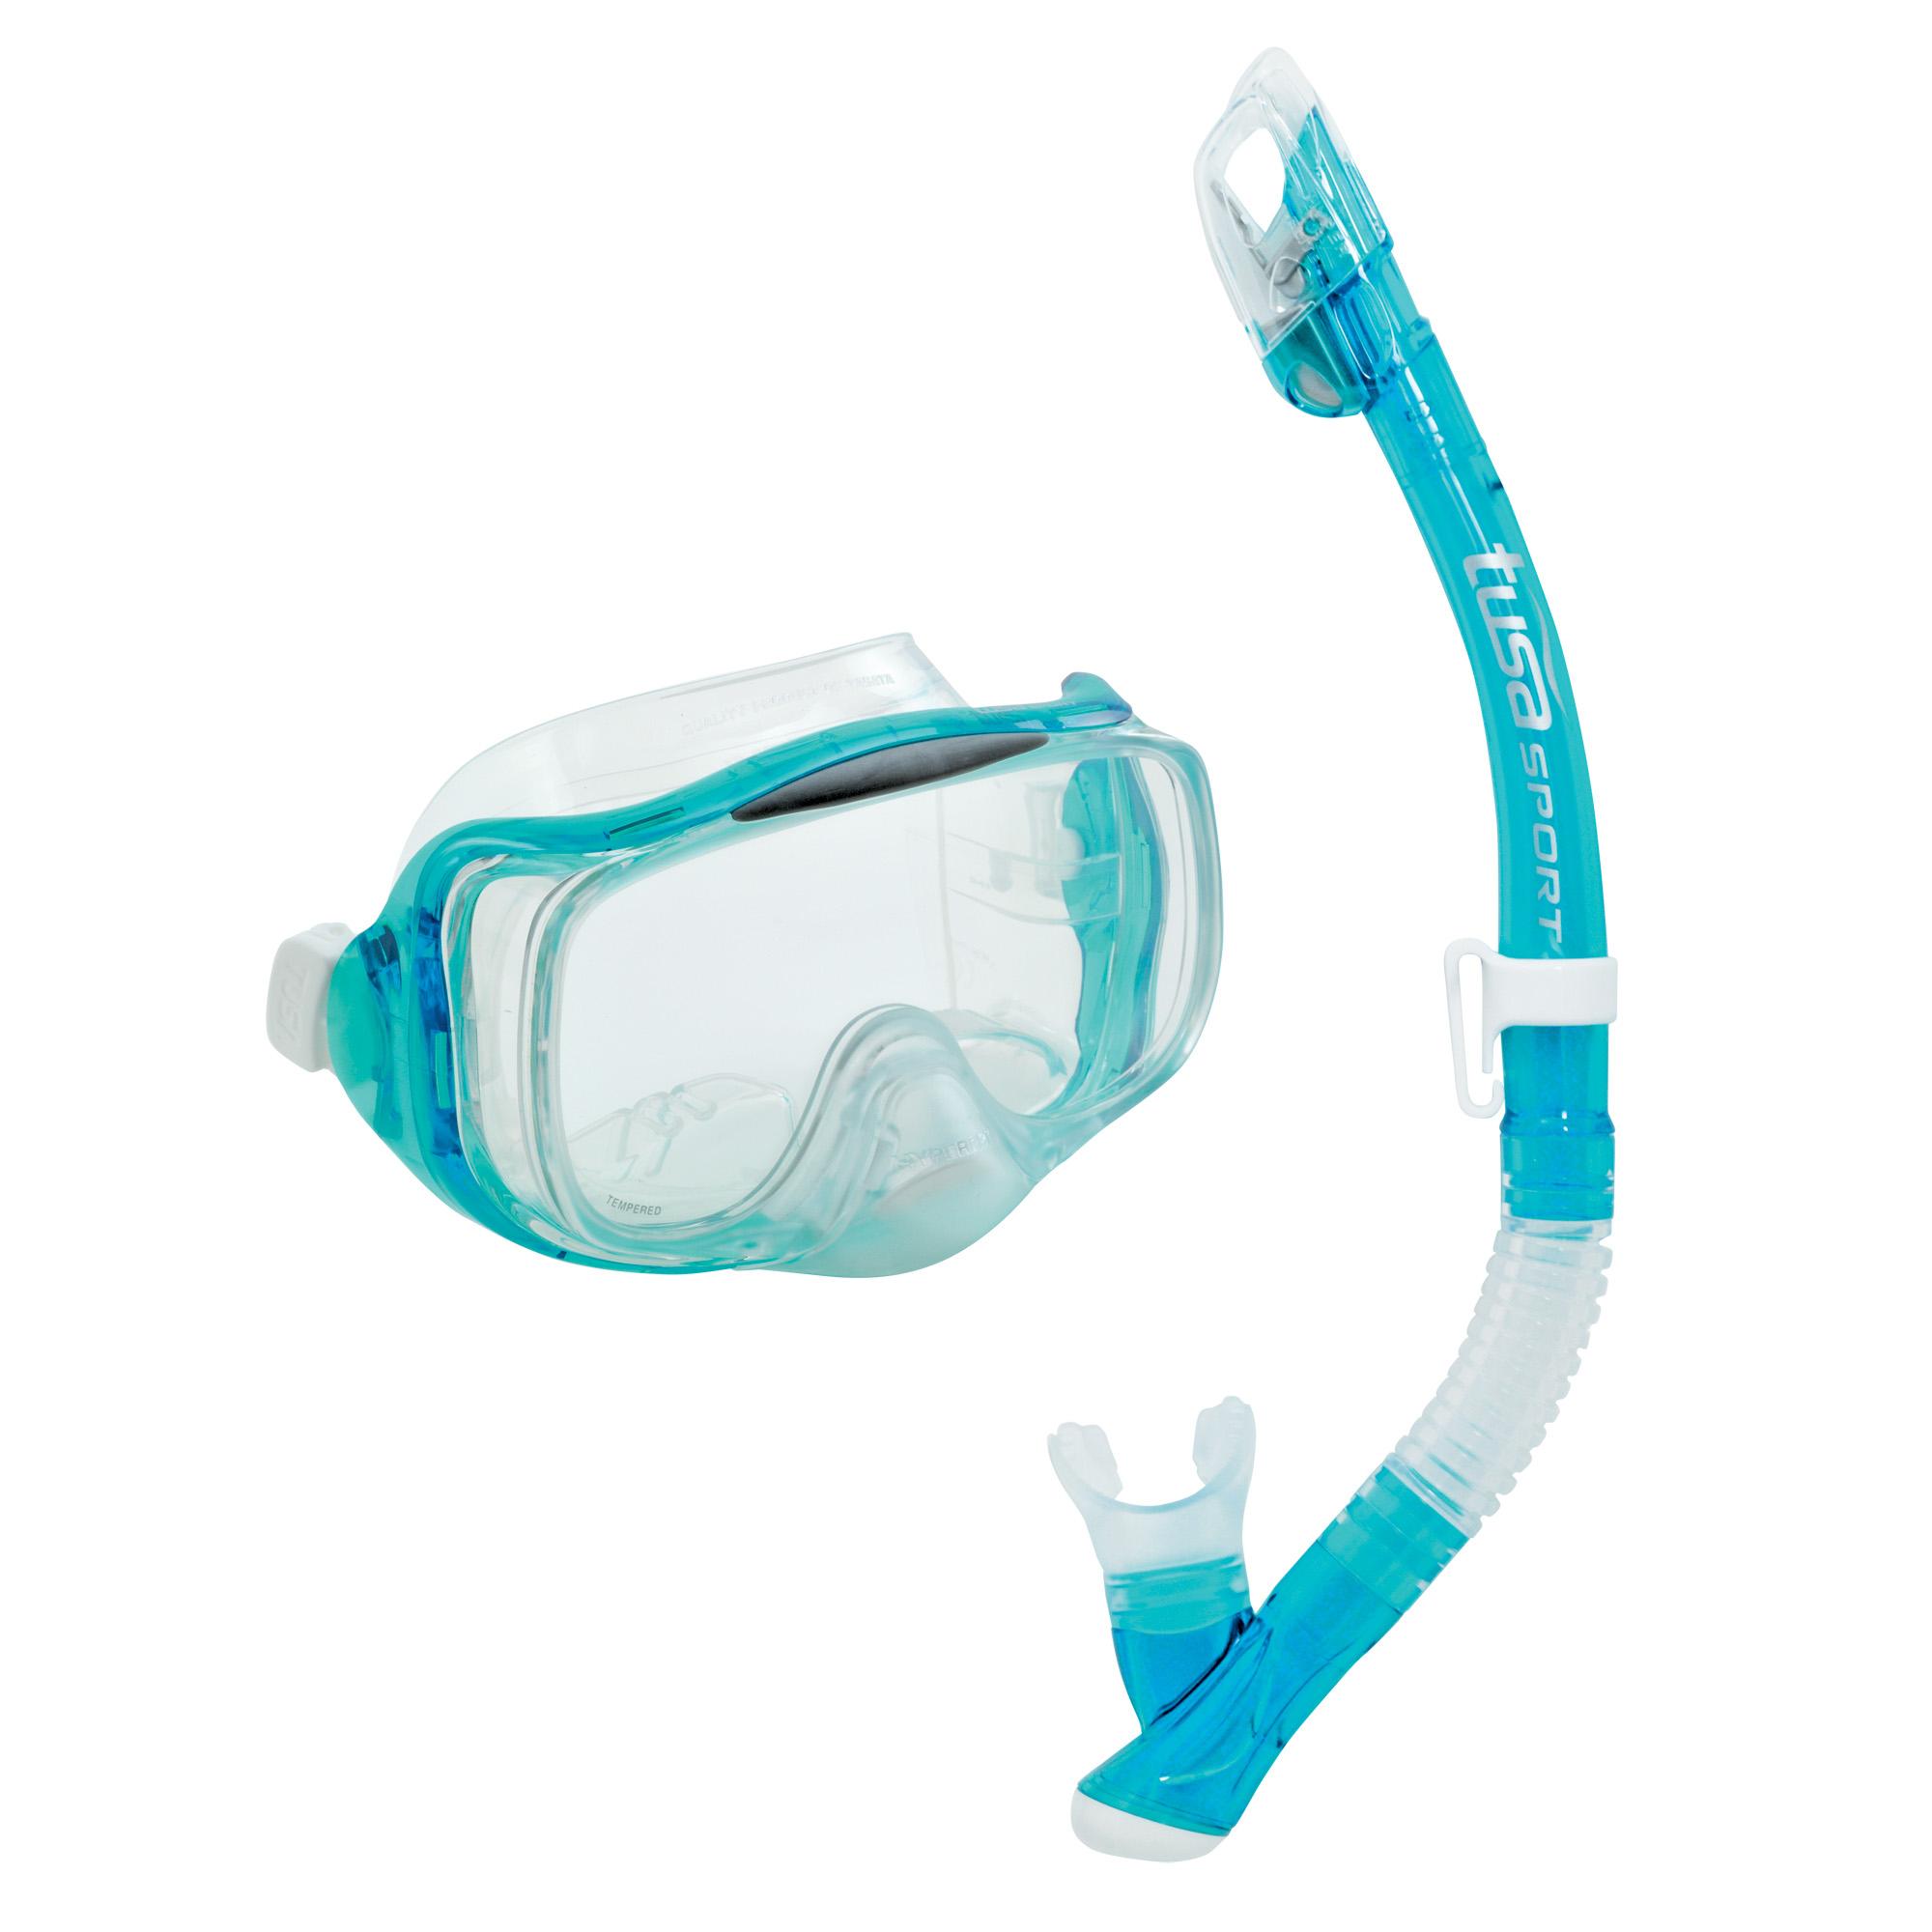 Tusa Комплект Tusa Imprex 3-D Dry: маска, трубка цена